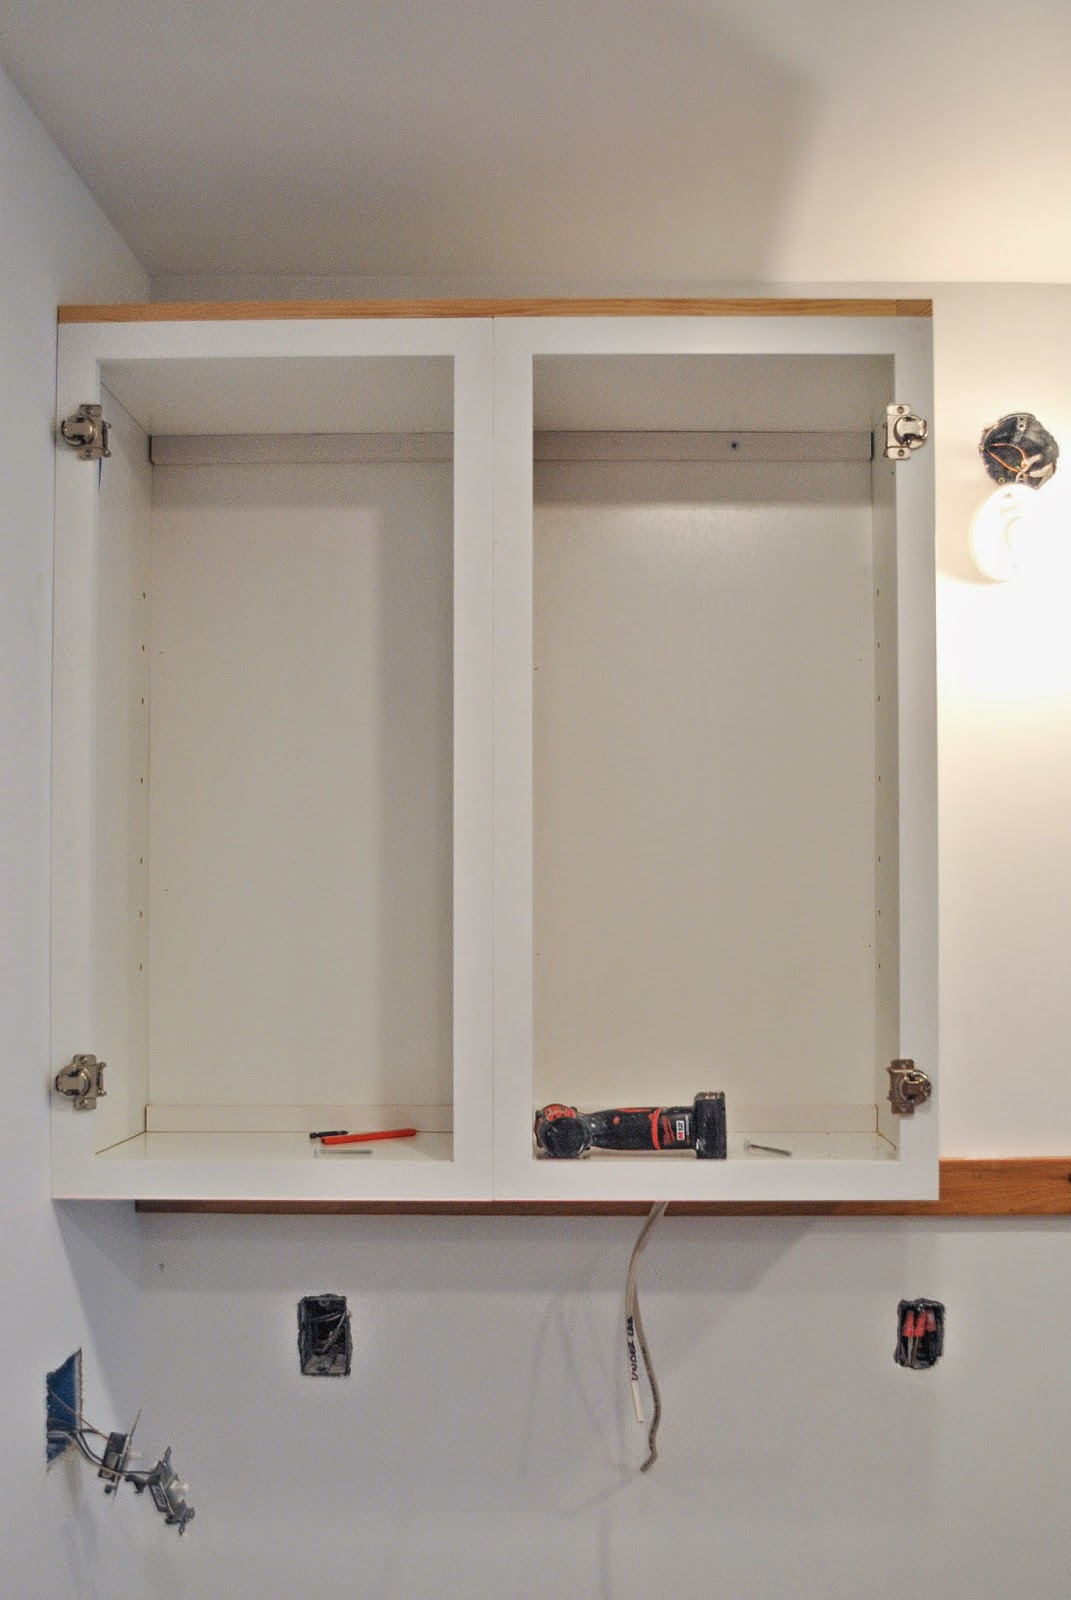 PBJstories: Installing Upper Kitchen Cabinets | #PBJstories